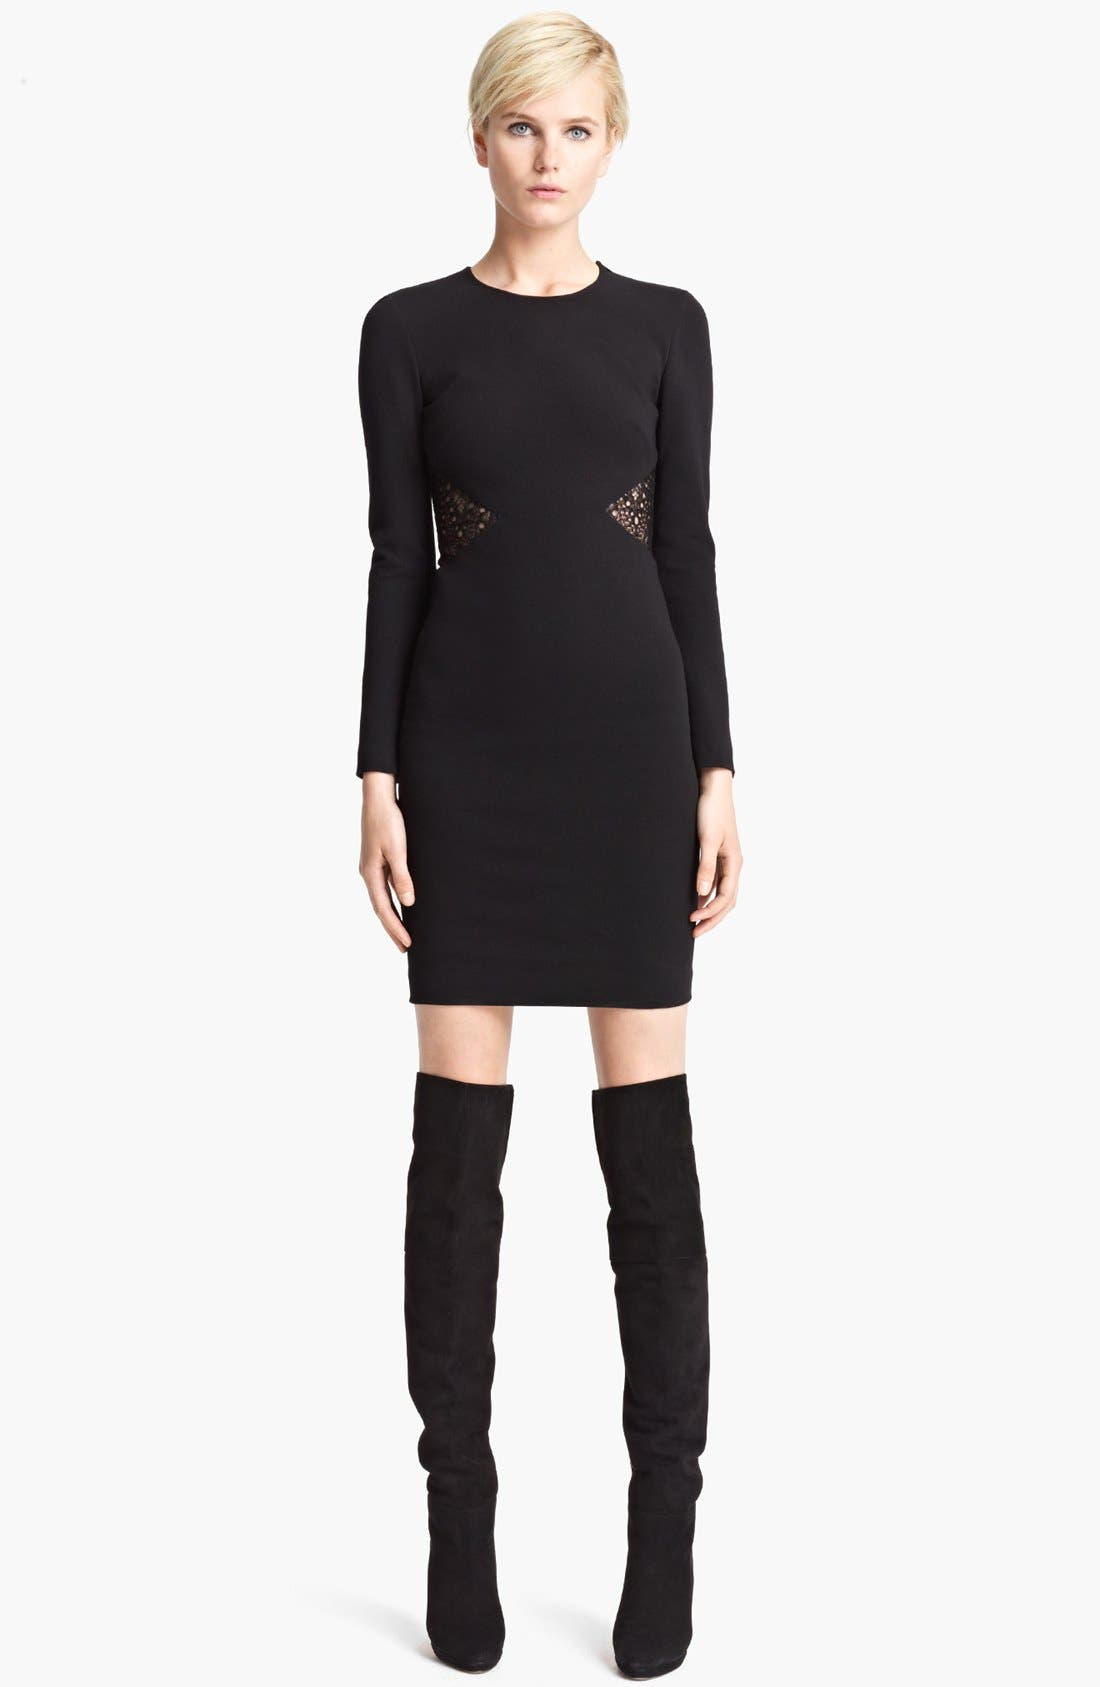 Alternate Image 1 Selected - Emilio Pucci Dress & Accessories